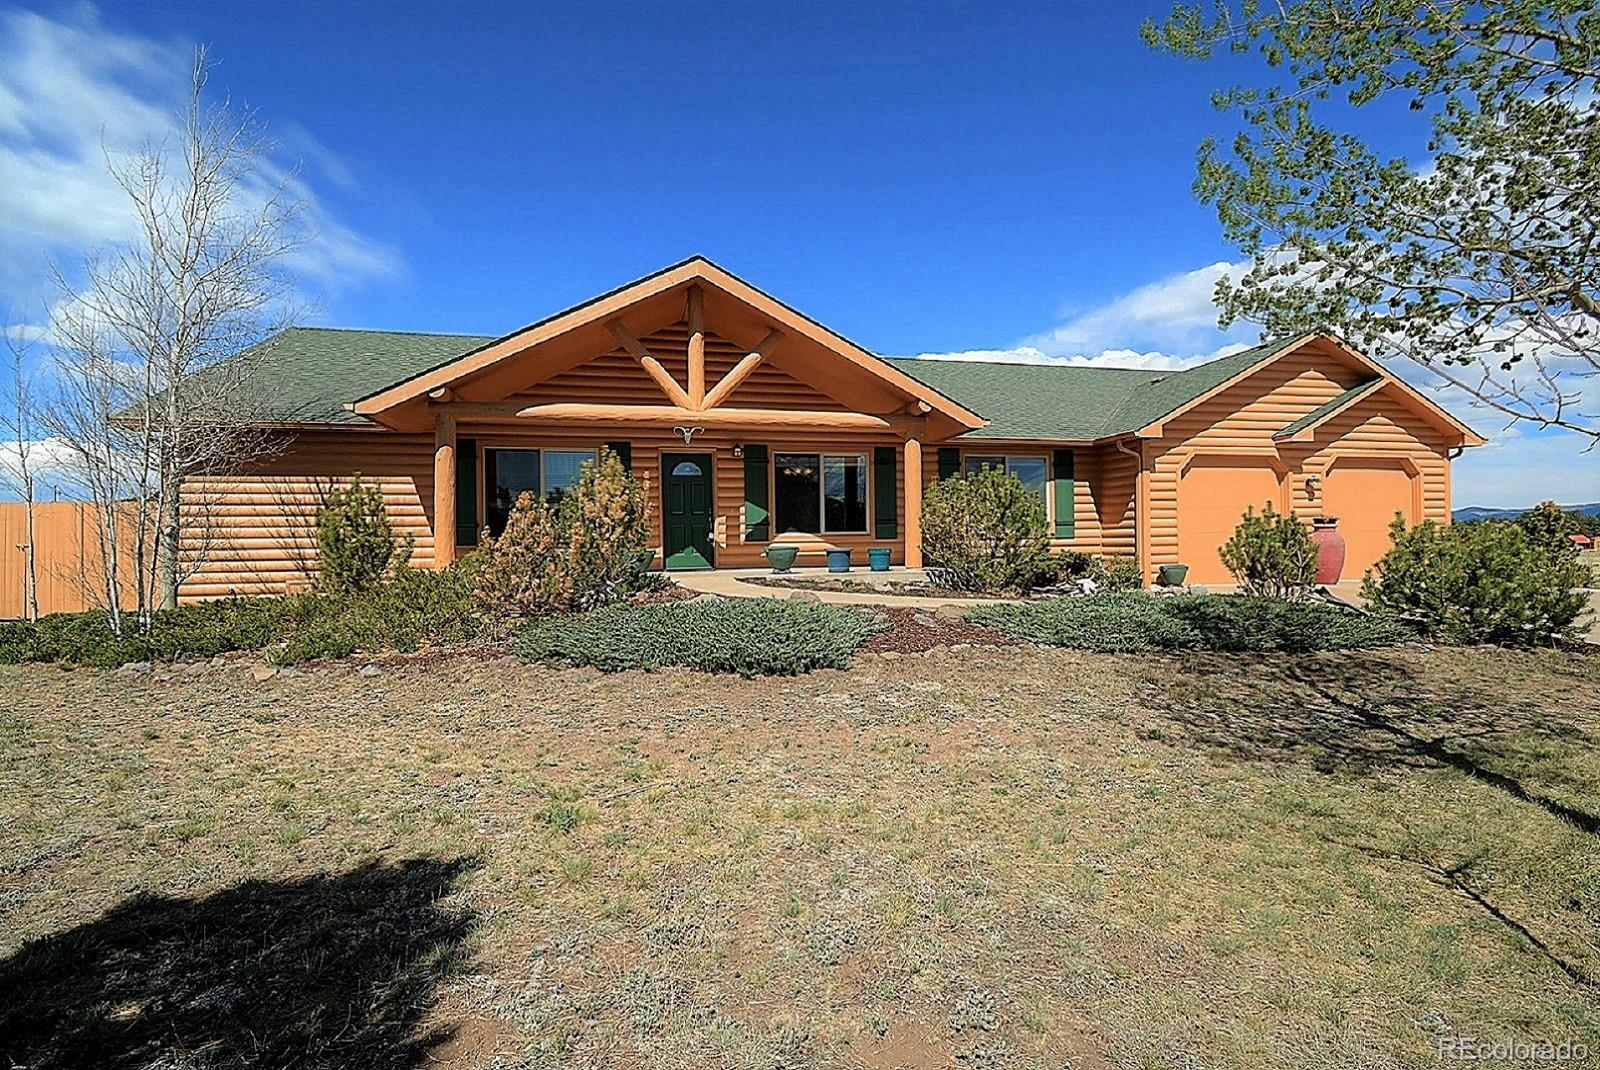 5020 County Road 71, Guffey, CO 80820 - Guffey, CO real estate listing